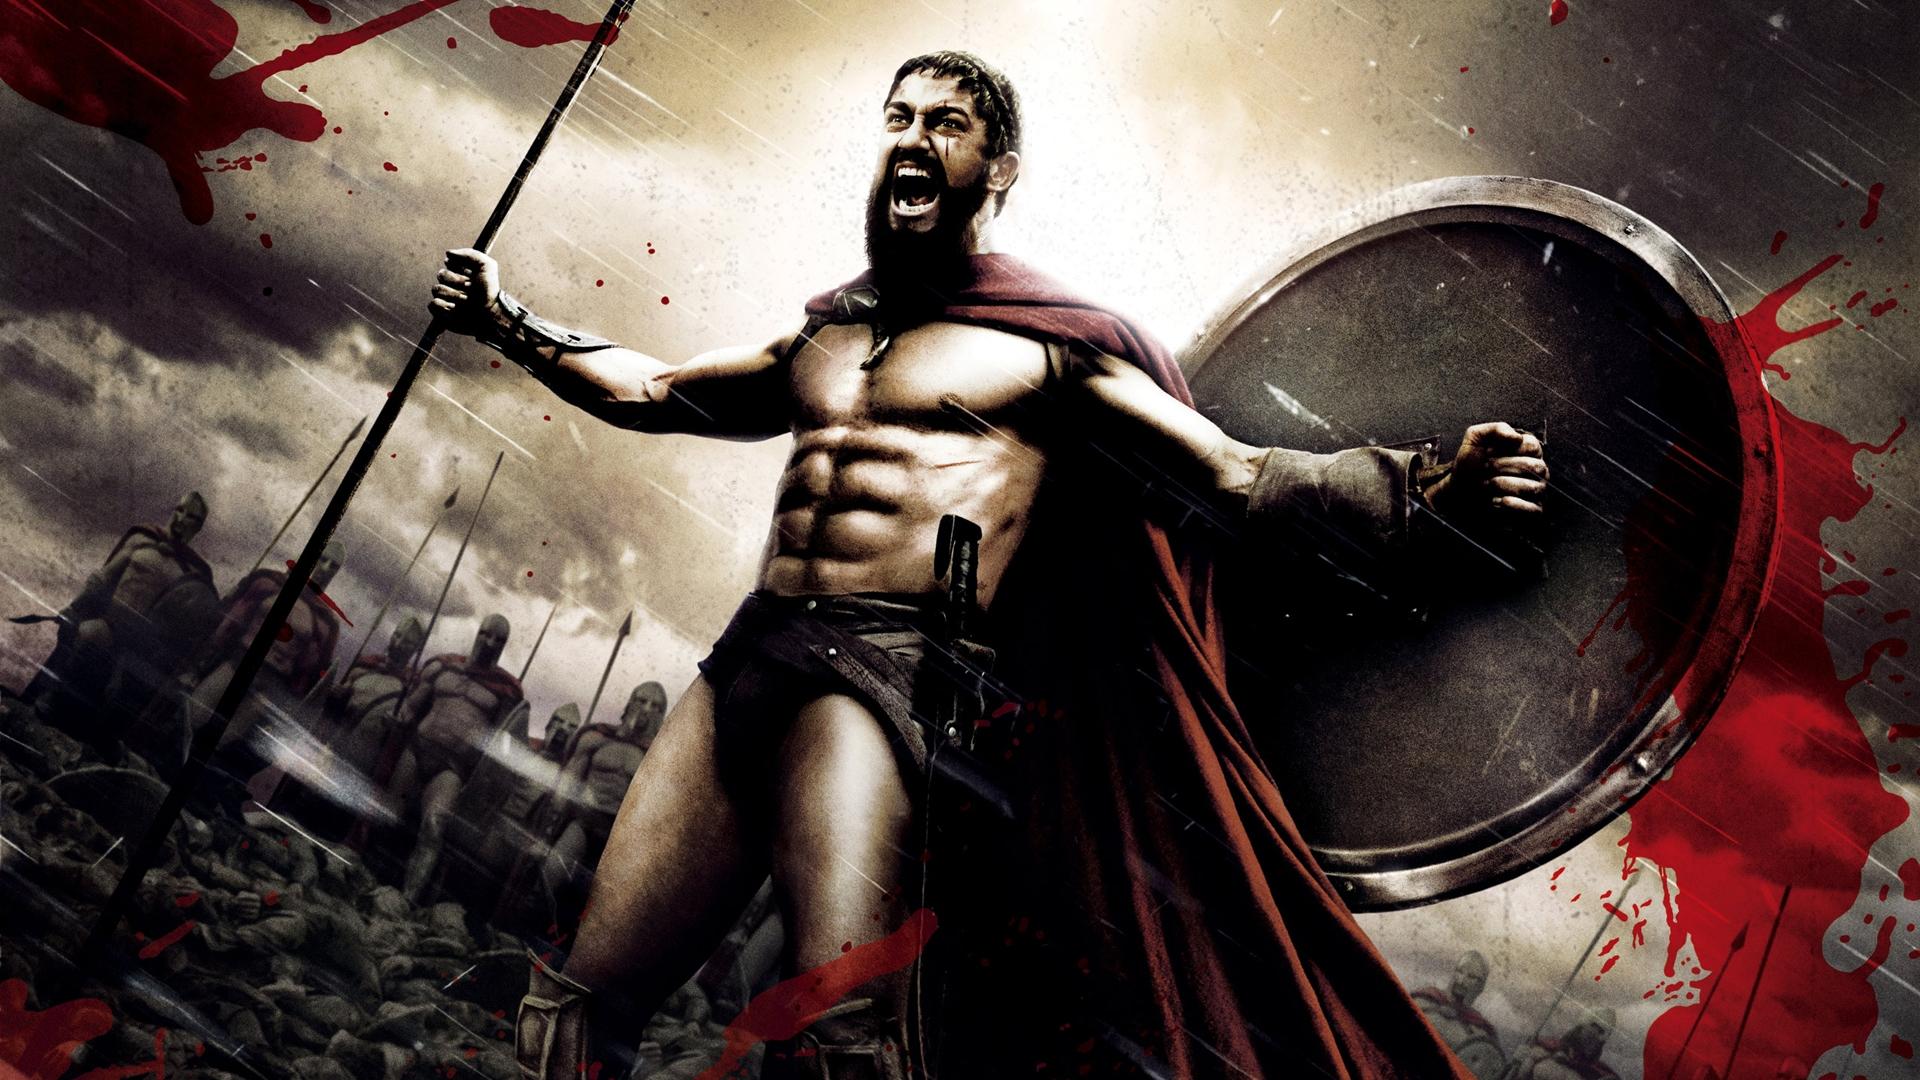 Wallpaper Blood King 300 Leonidas Gerard Butler Art Darkness